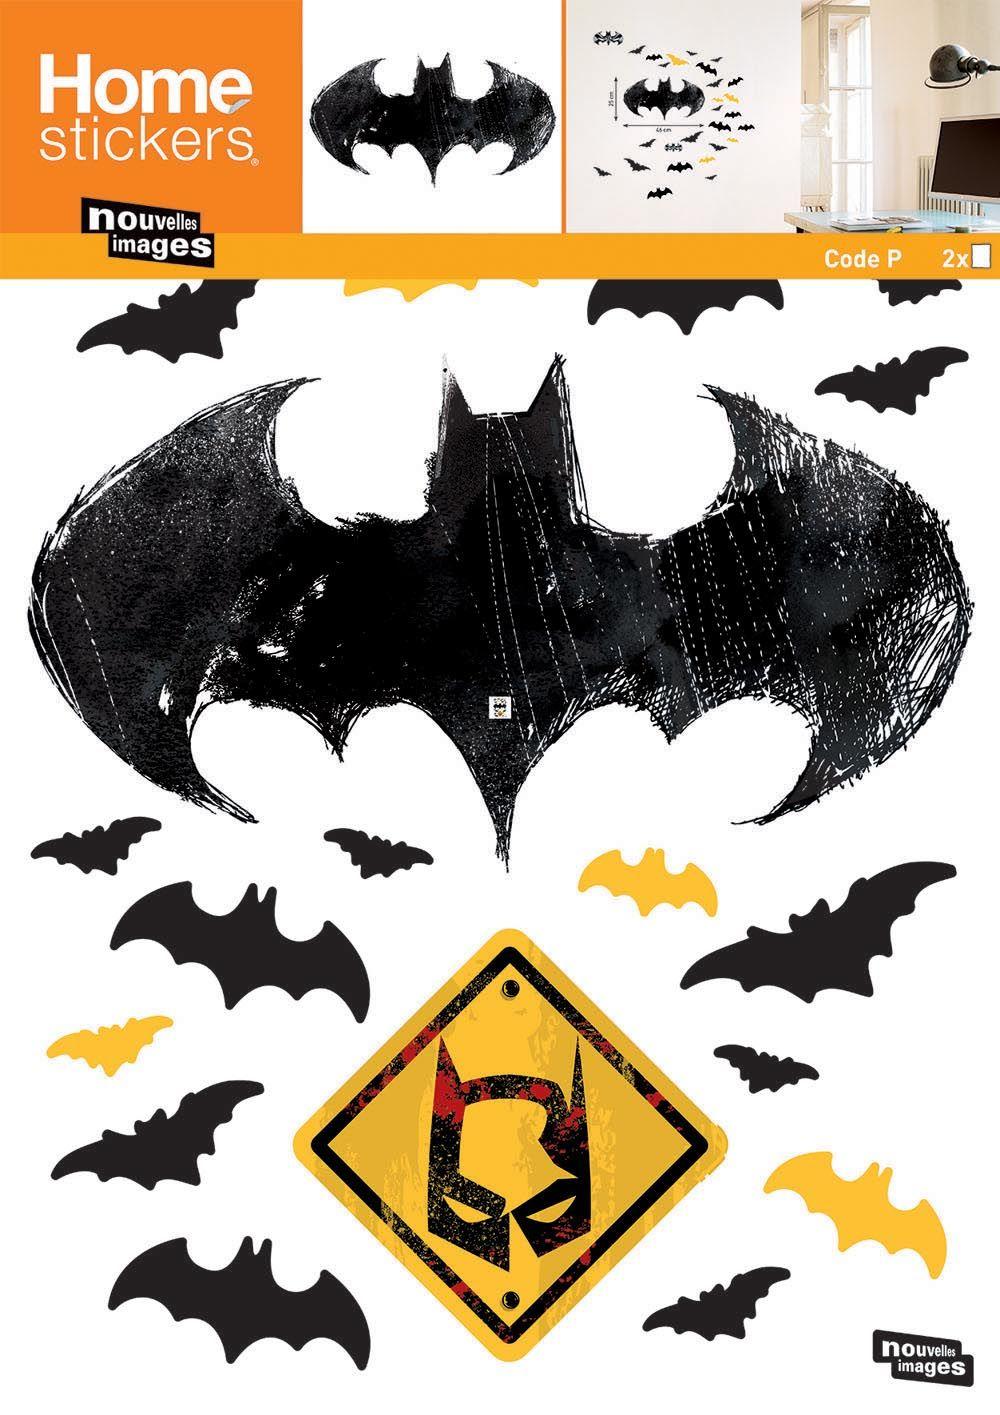 sticker mural batman logo chauve souris eur 22 90 picclick fr. Black Bedroom Furniture Sets. Home Design Ideas